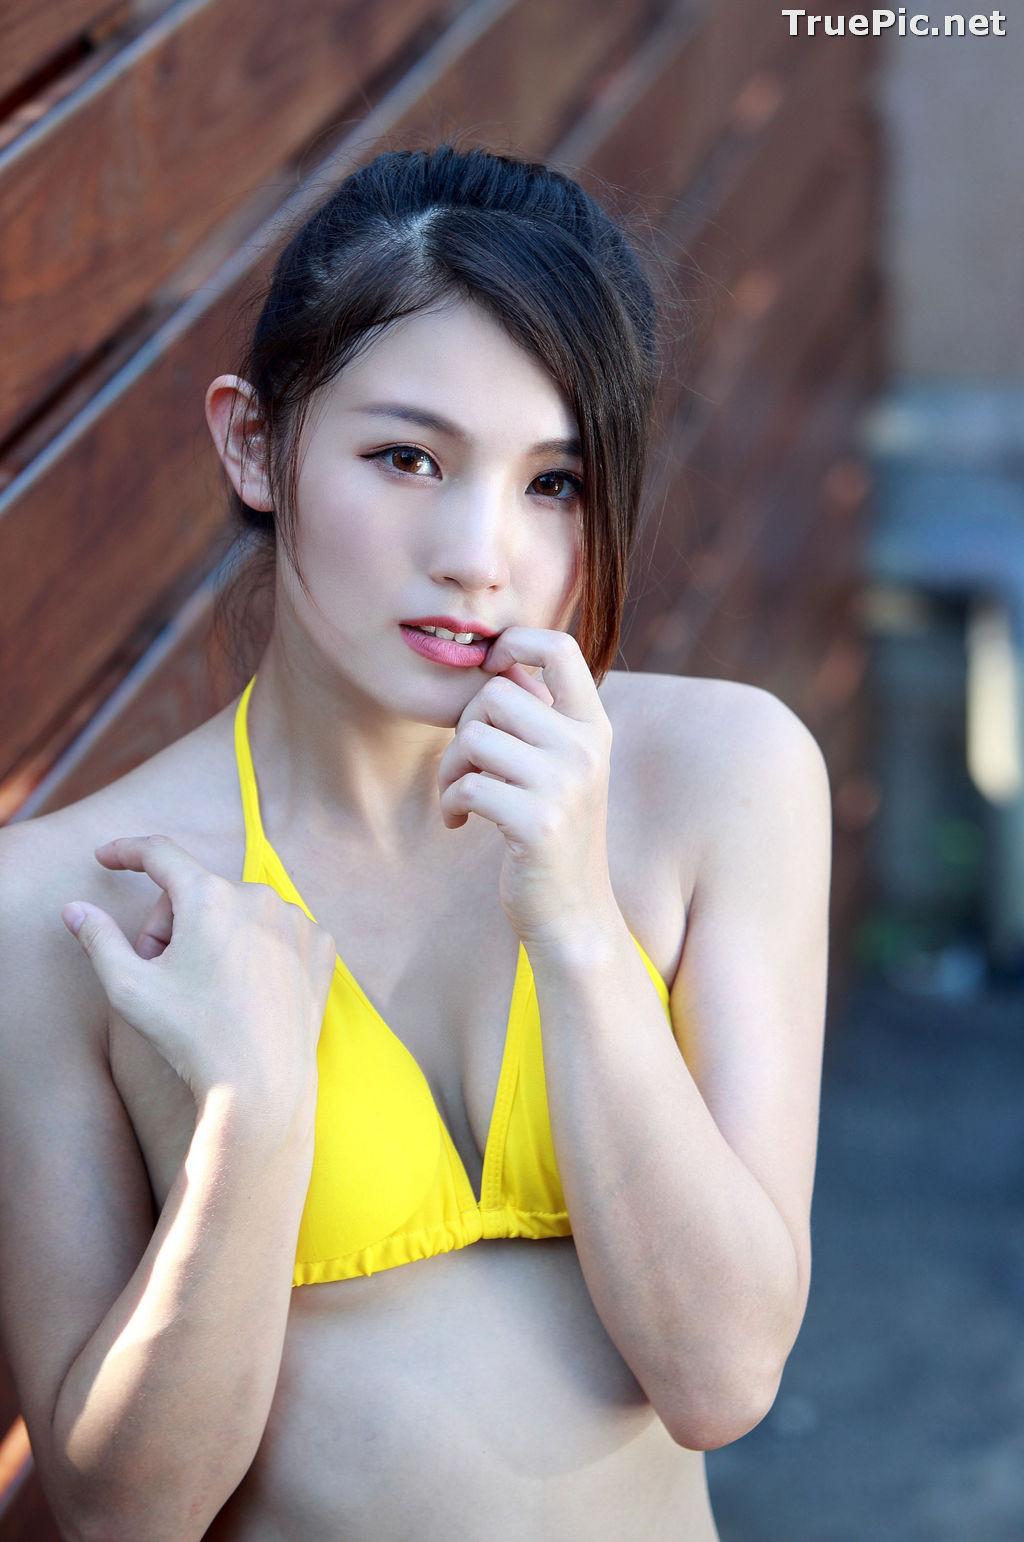 Image Taiwanese Model - 花巧娟 - Lovely and Pretty Yellow Bikini Girl - TruePic.net - Picture-6